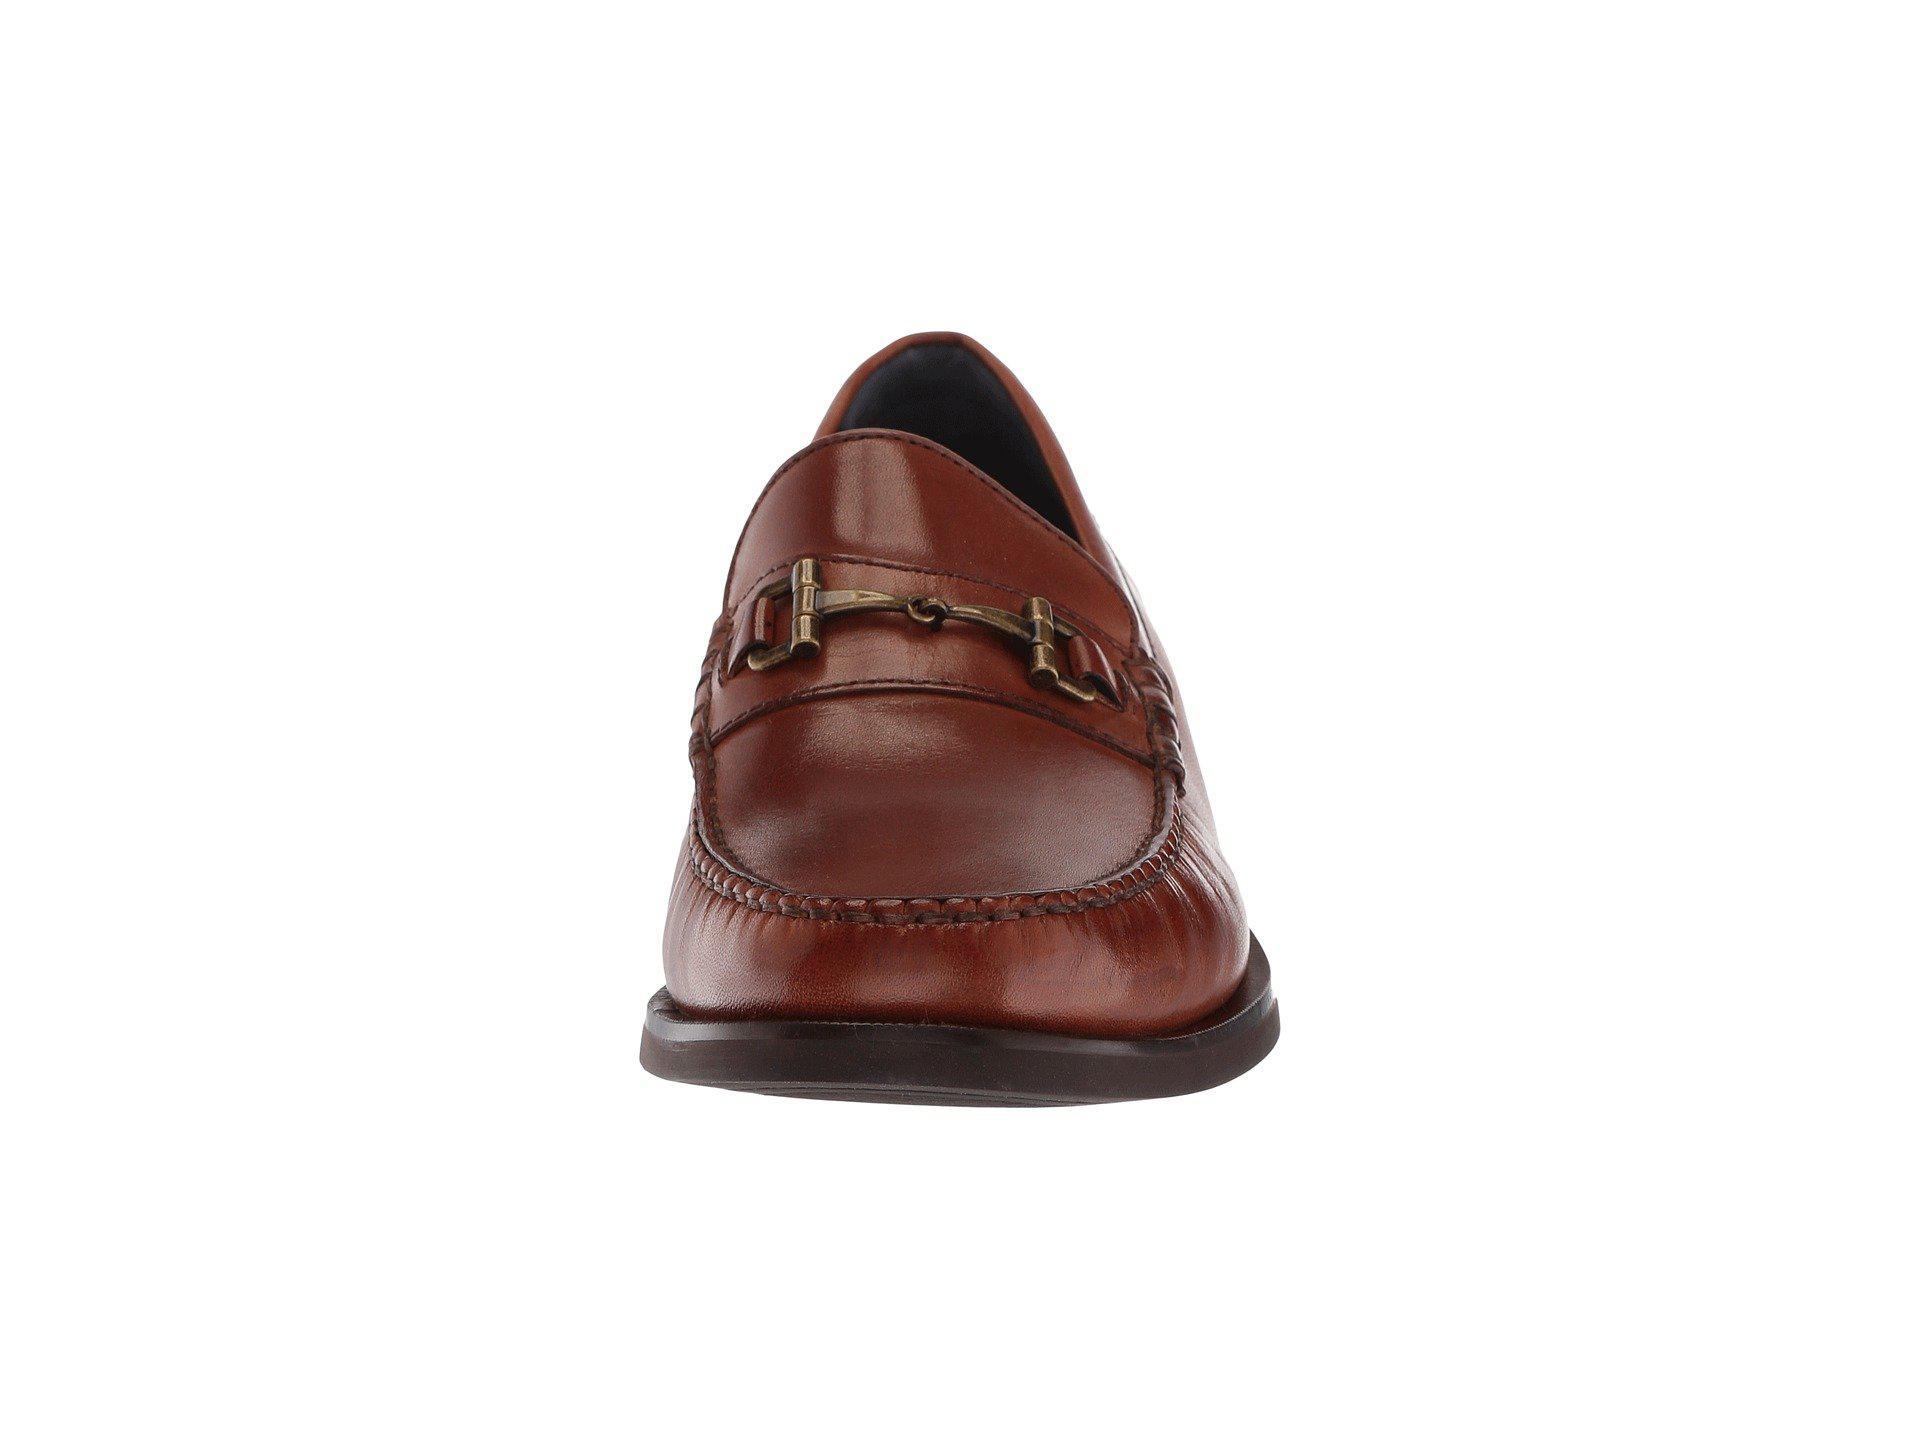 75e7c98826b Cole Haan - Brown Pinch Sanford Bit Loafer for Men - Lyst. View fullscreen